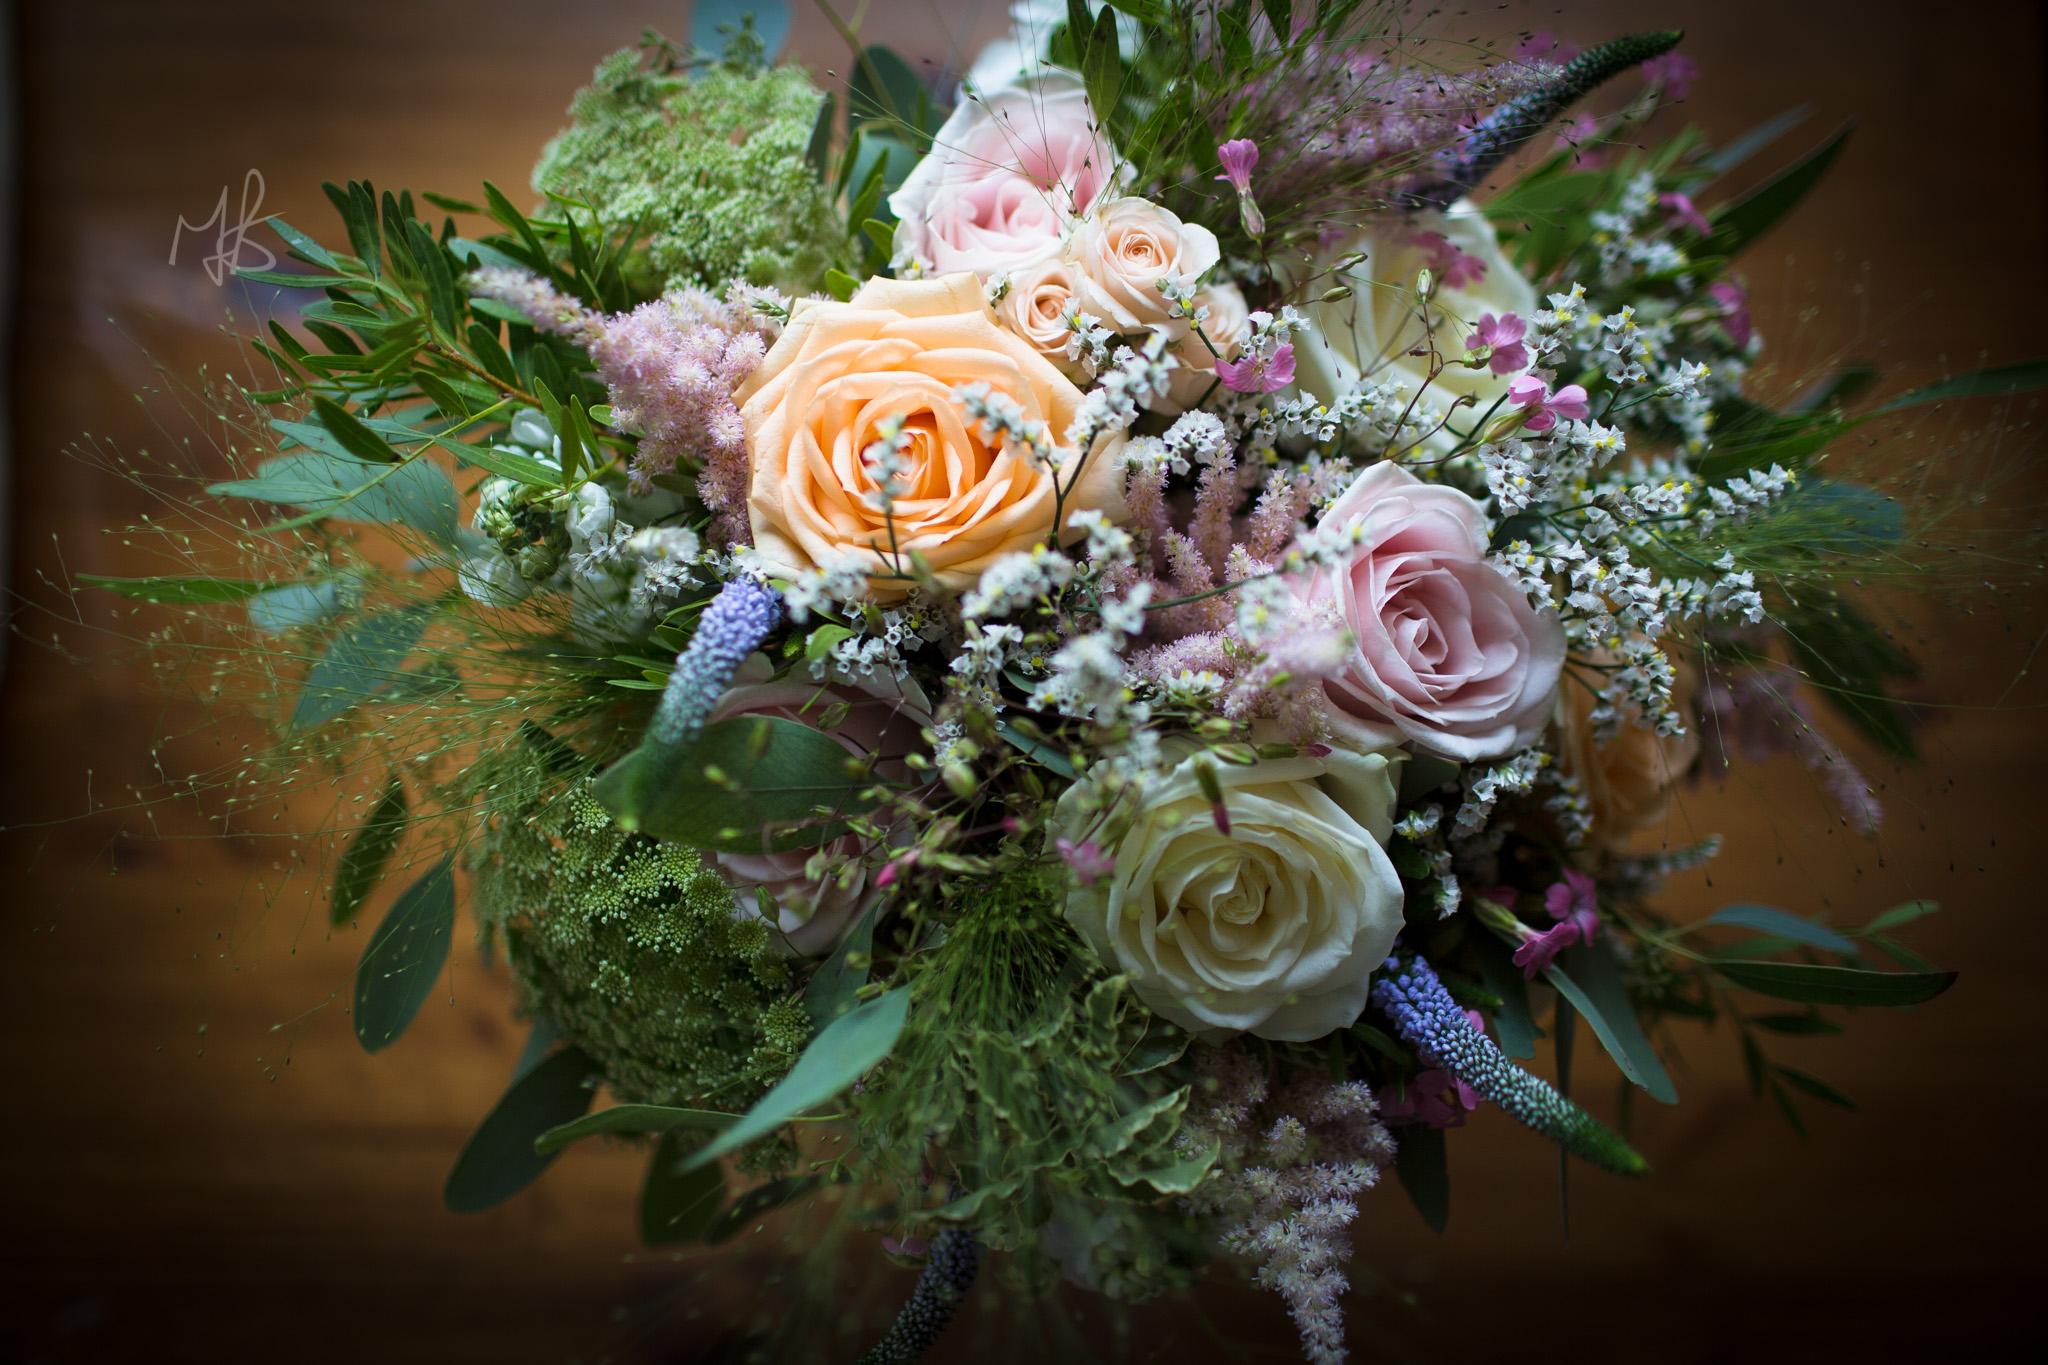 Northern-Ireland-Wedding-Photographer-Mark-Barnes-Ballymena_wedding-photography-Leighinmohr-House-Seamas_Alanna_For-web-6.jpg